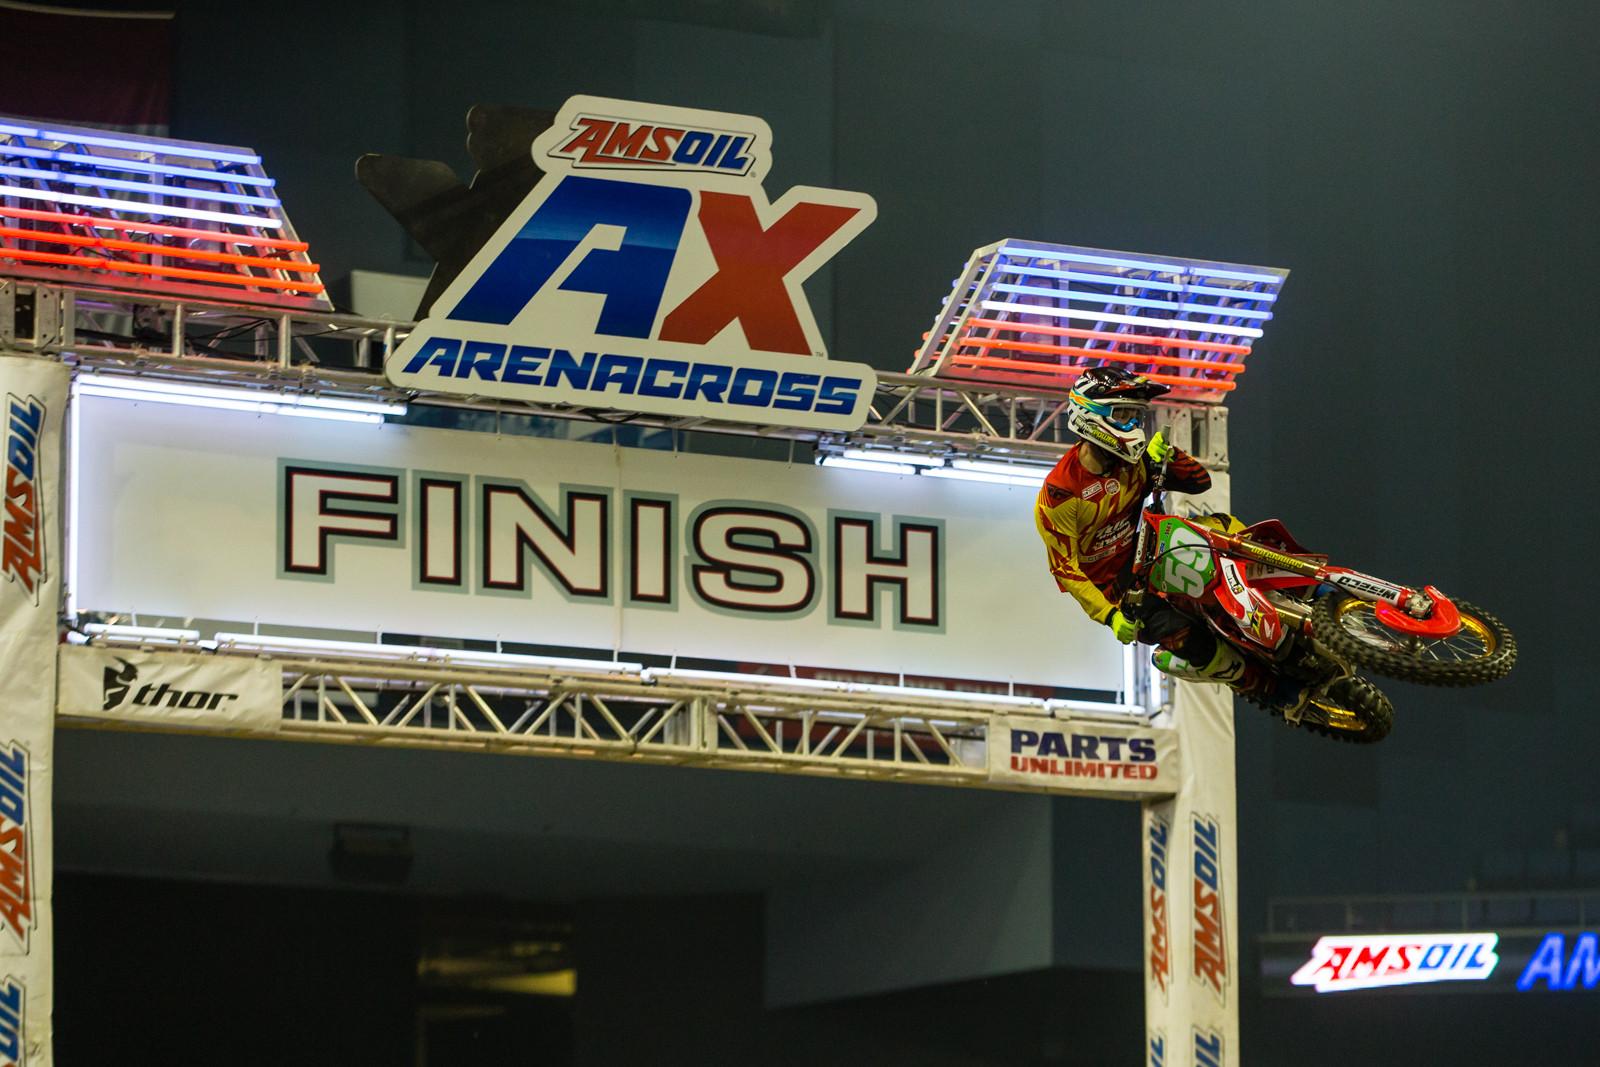 Opening Ceremonies  - Photo Gallery: Ontario Arenacross - Saturday Night - Motocross Pictures - Vital MX